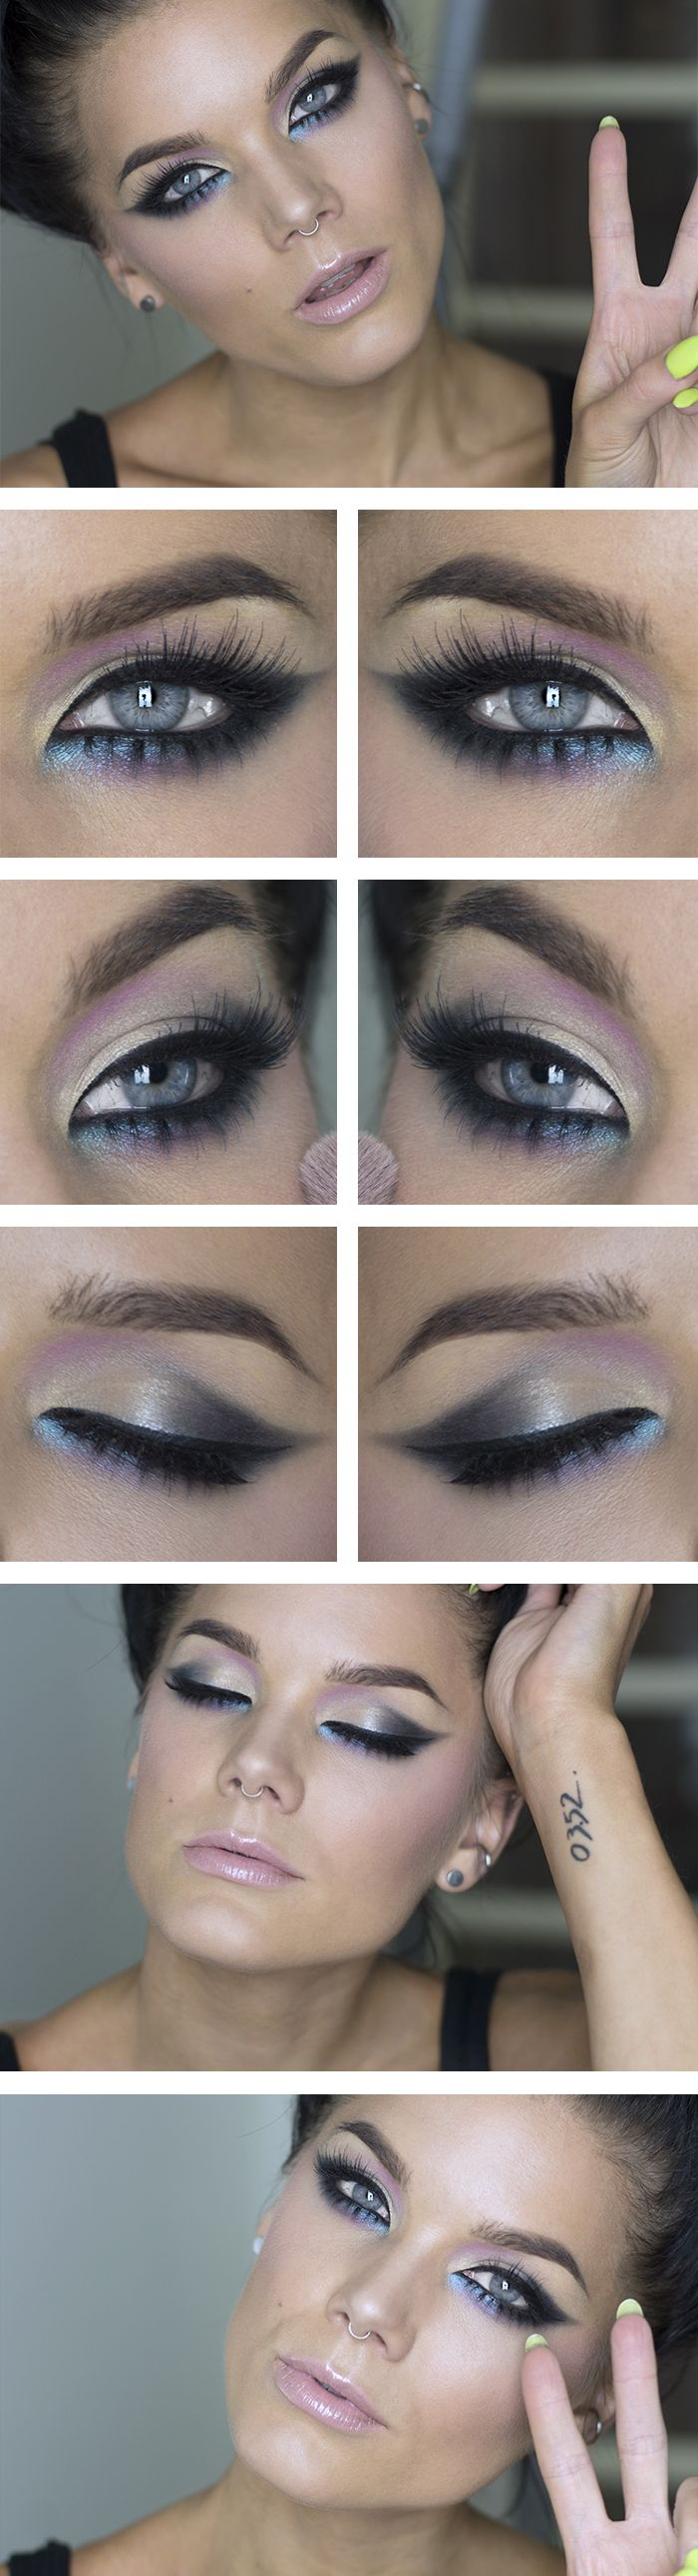 Eye make up with blue liner